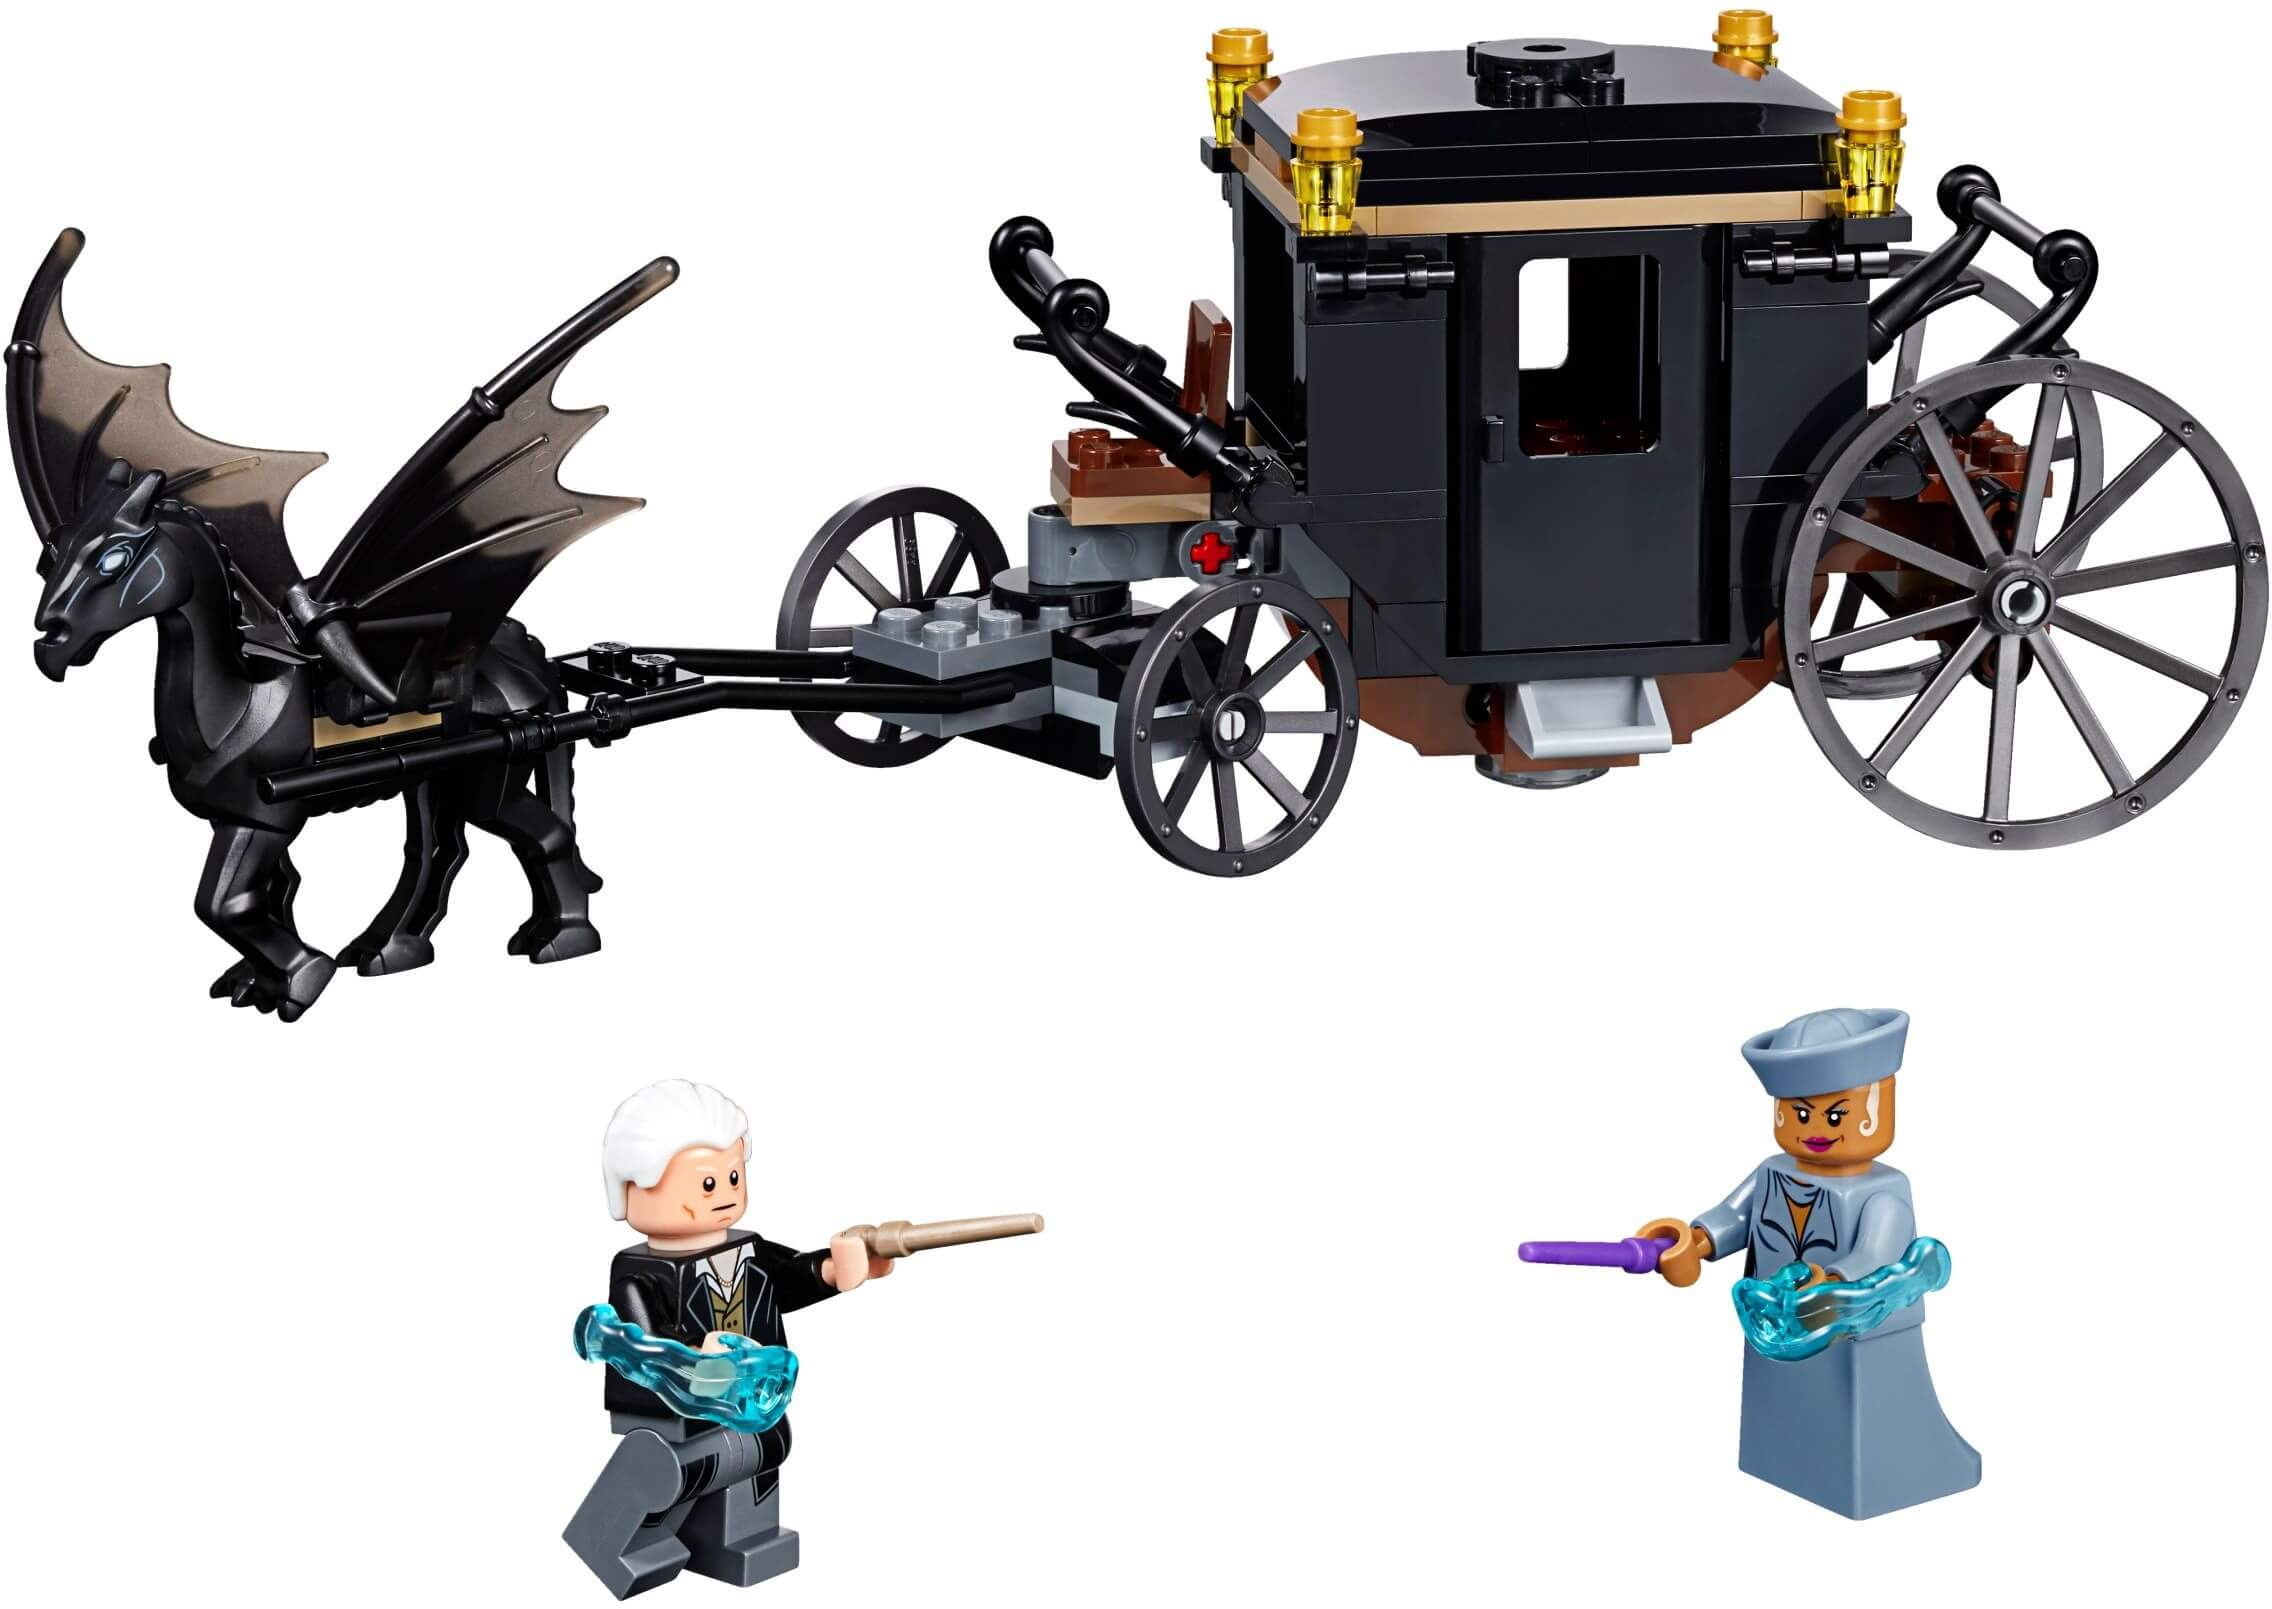 Mua đồ chơi LEGO 75951 - LEGO Harry Potter 75951 - Cuộc tẩu thoát của Grindelwald (LEGO 75951 Grindelwald´s Escape)